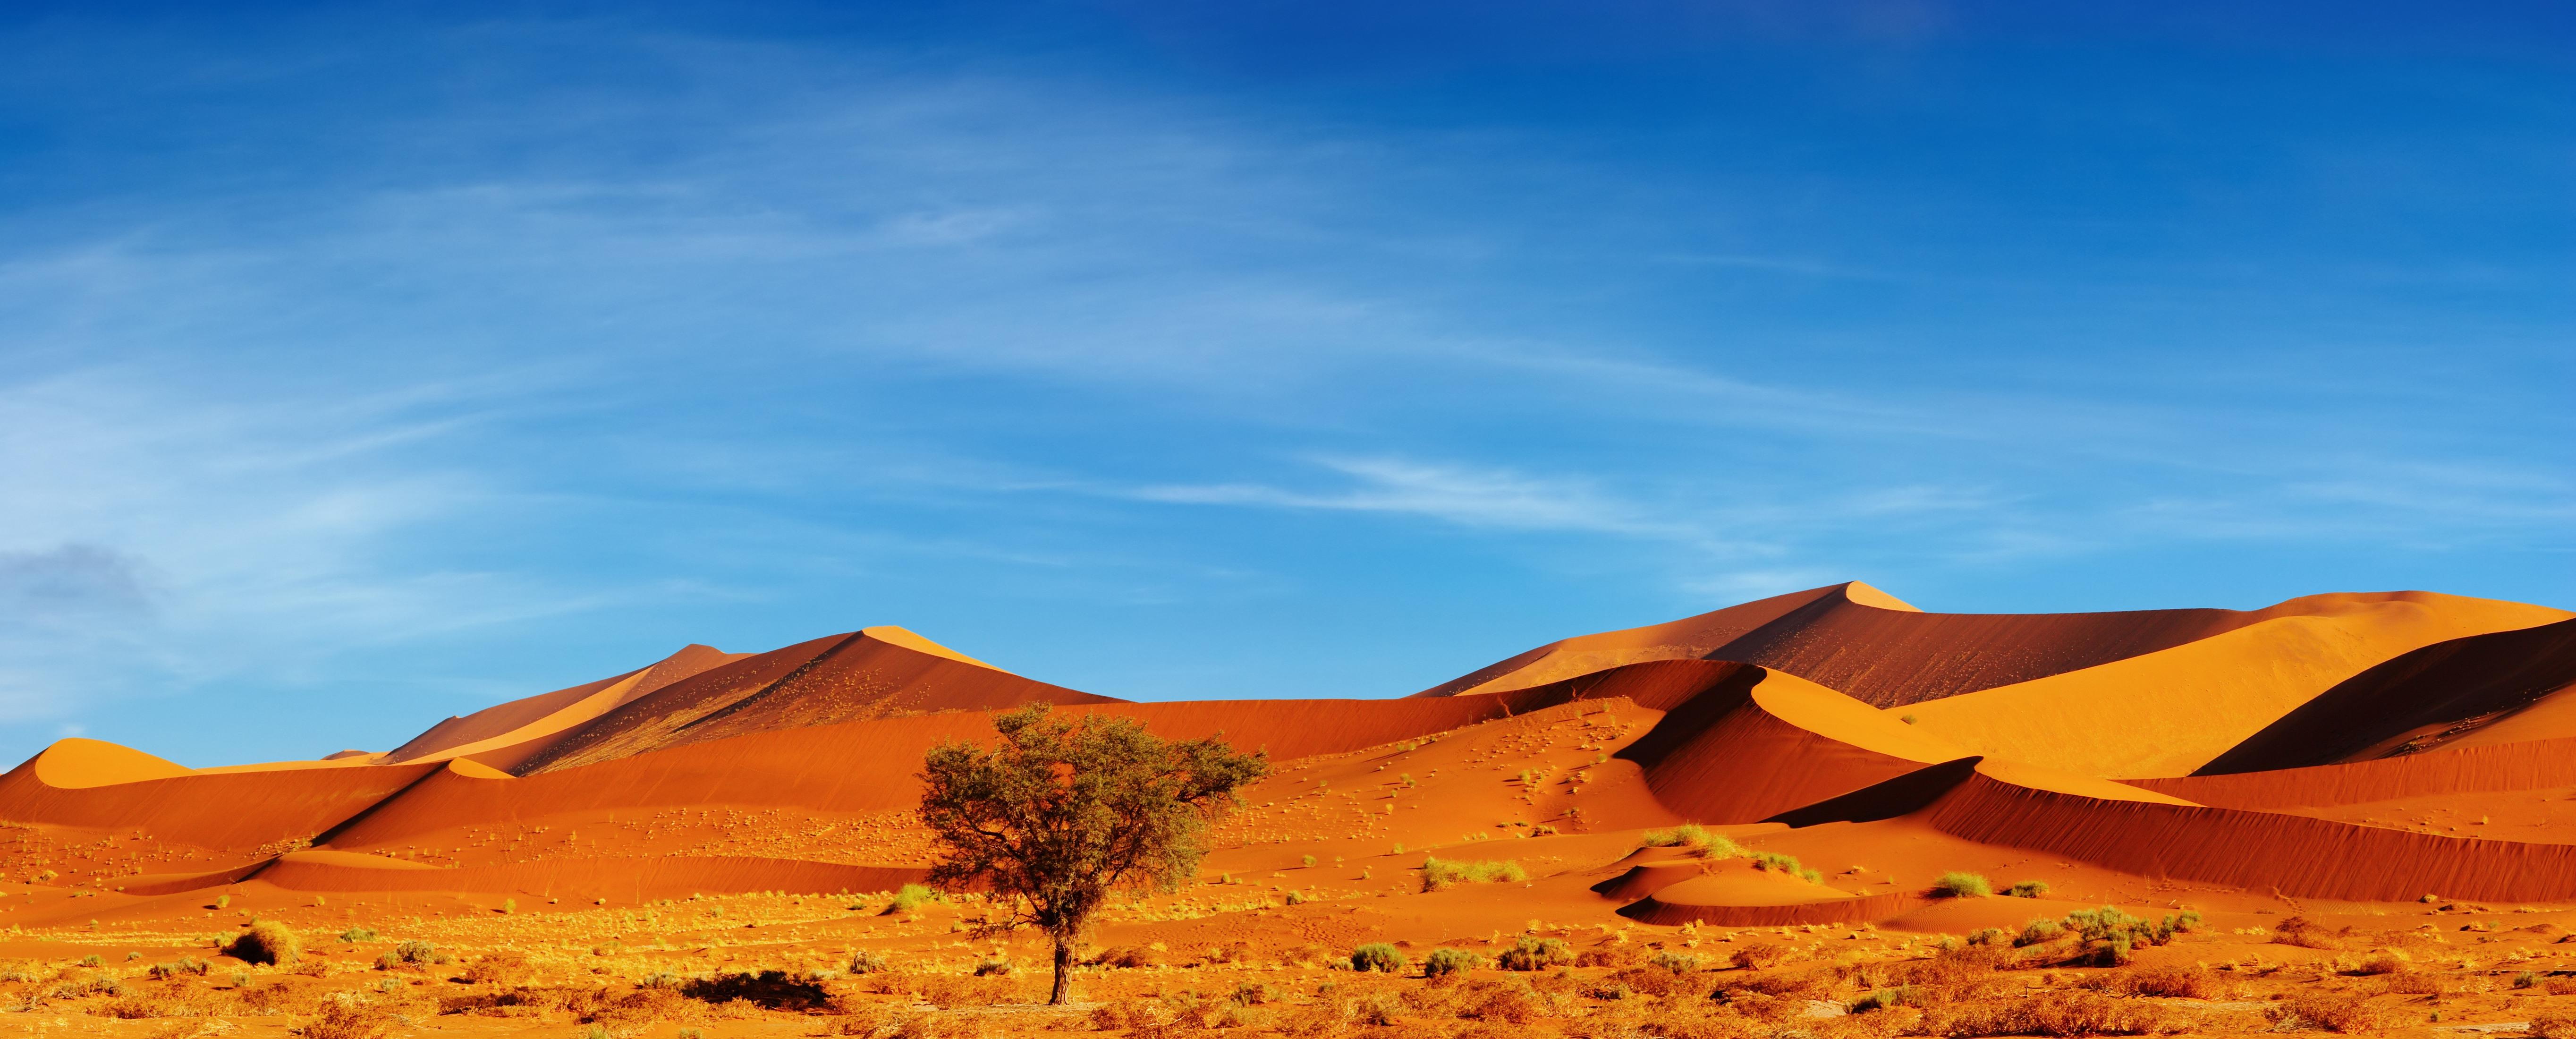 Namibia: Entspannt erleben